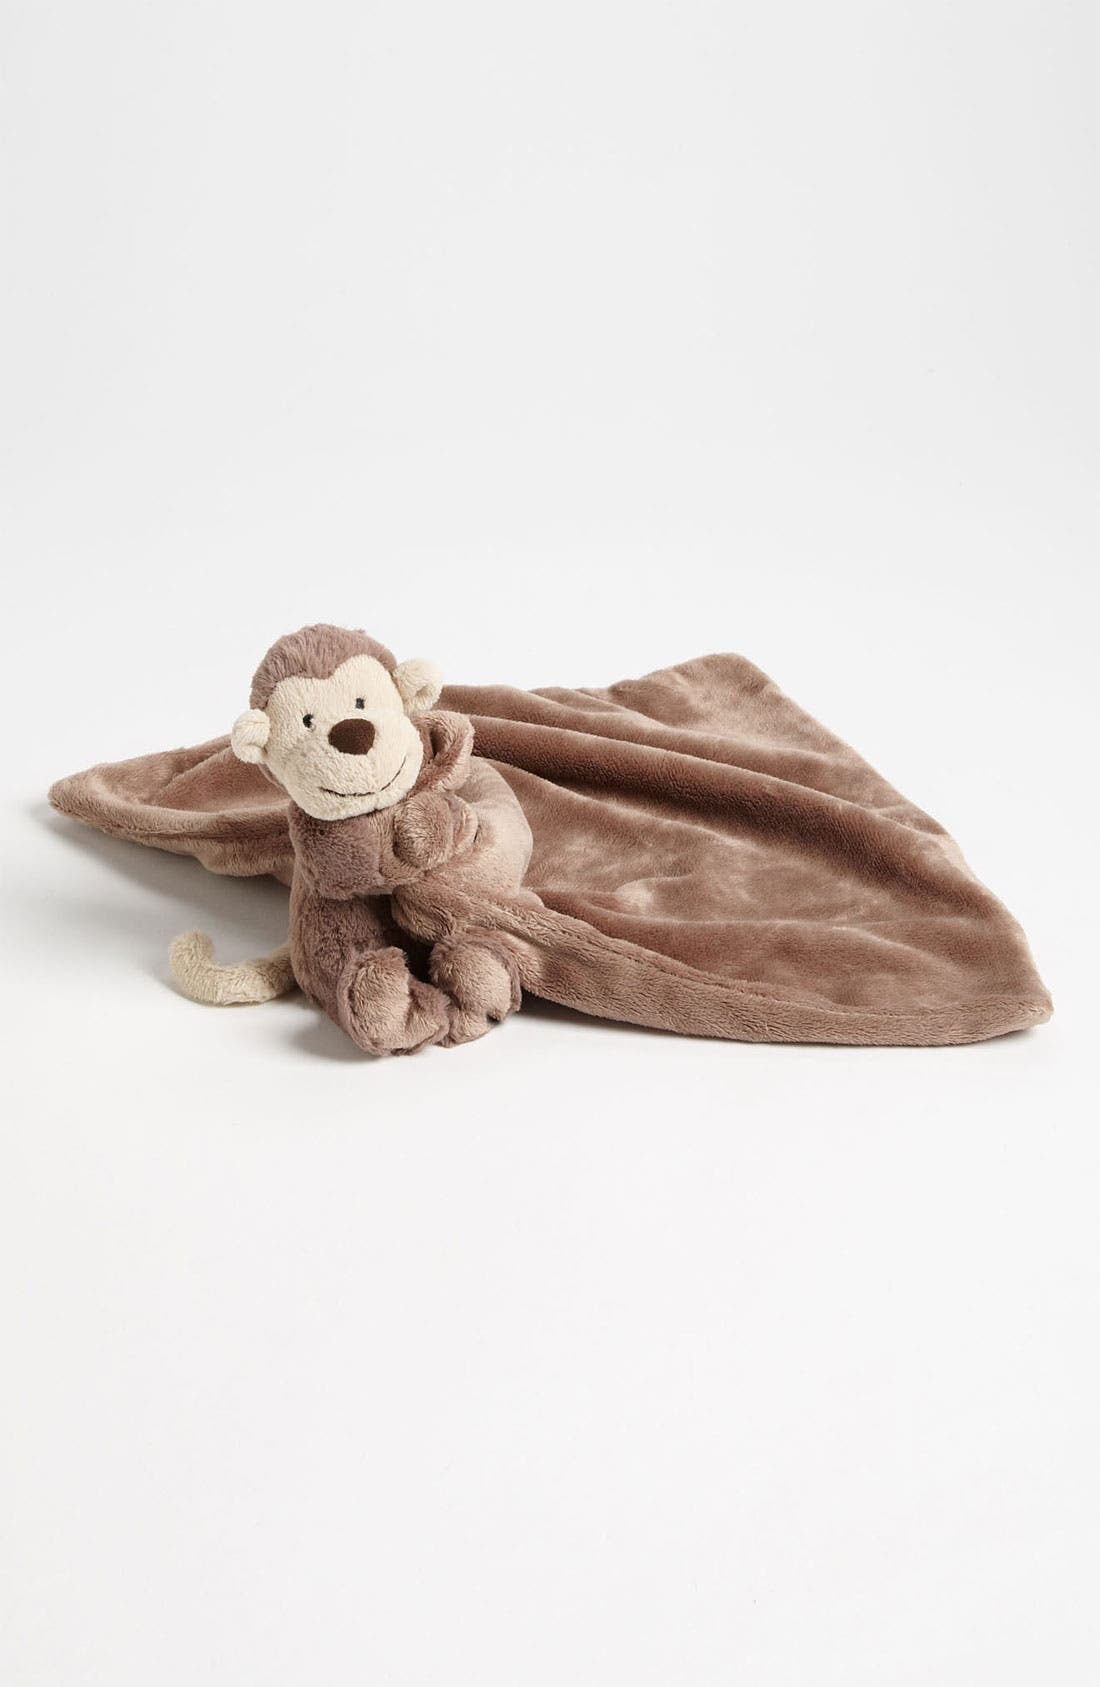 'Bashful Monkey Soother' Stuffed Animal & Blanket,                             Main thumbnail 1, color,                             Brown